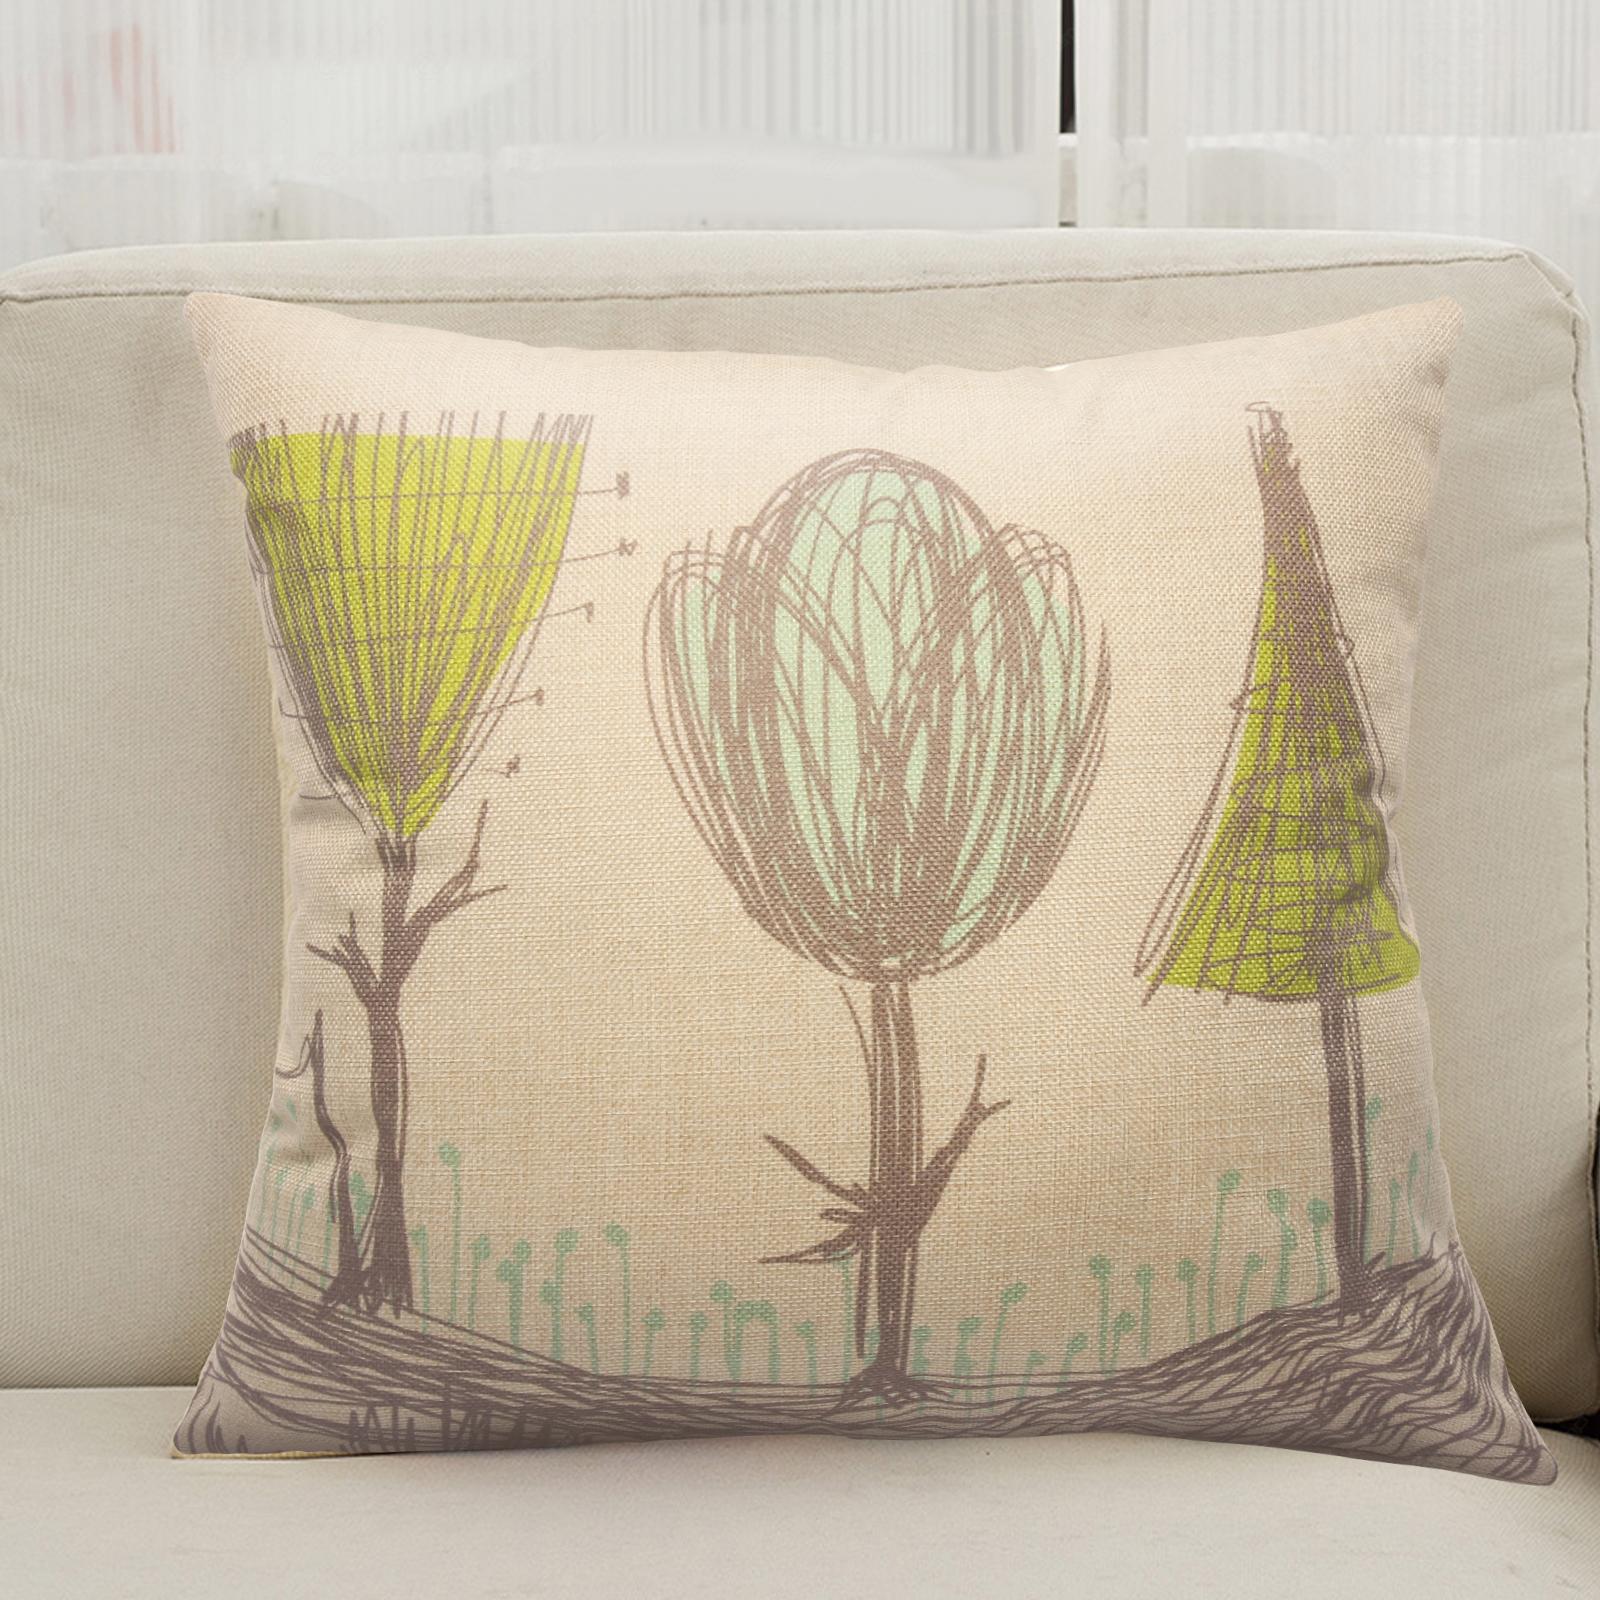 "Home Decor 18"" Vintage Sofa Throw Pillow Case Cushion Cover Inner"